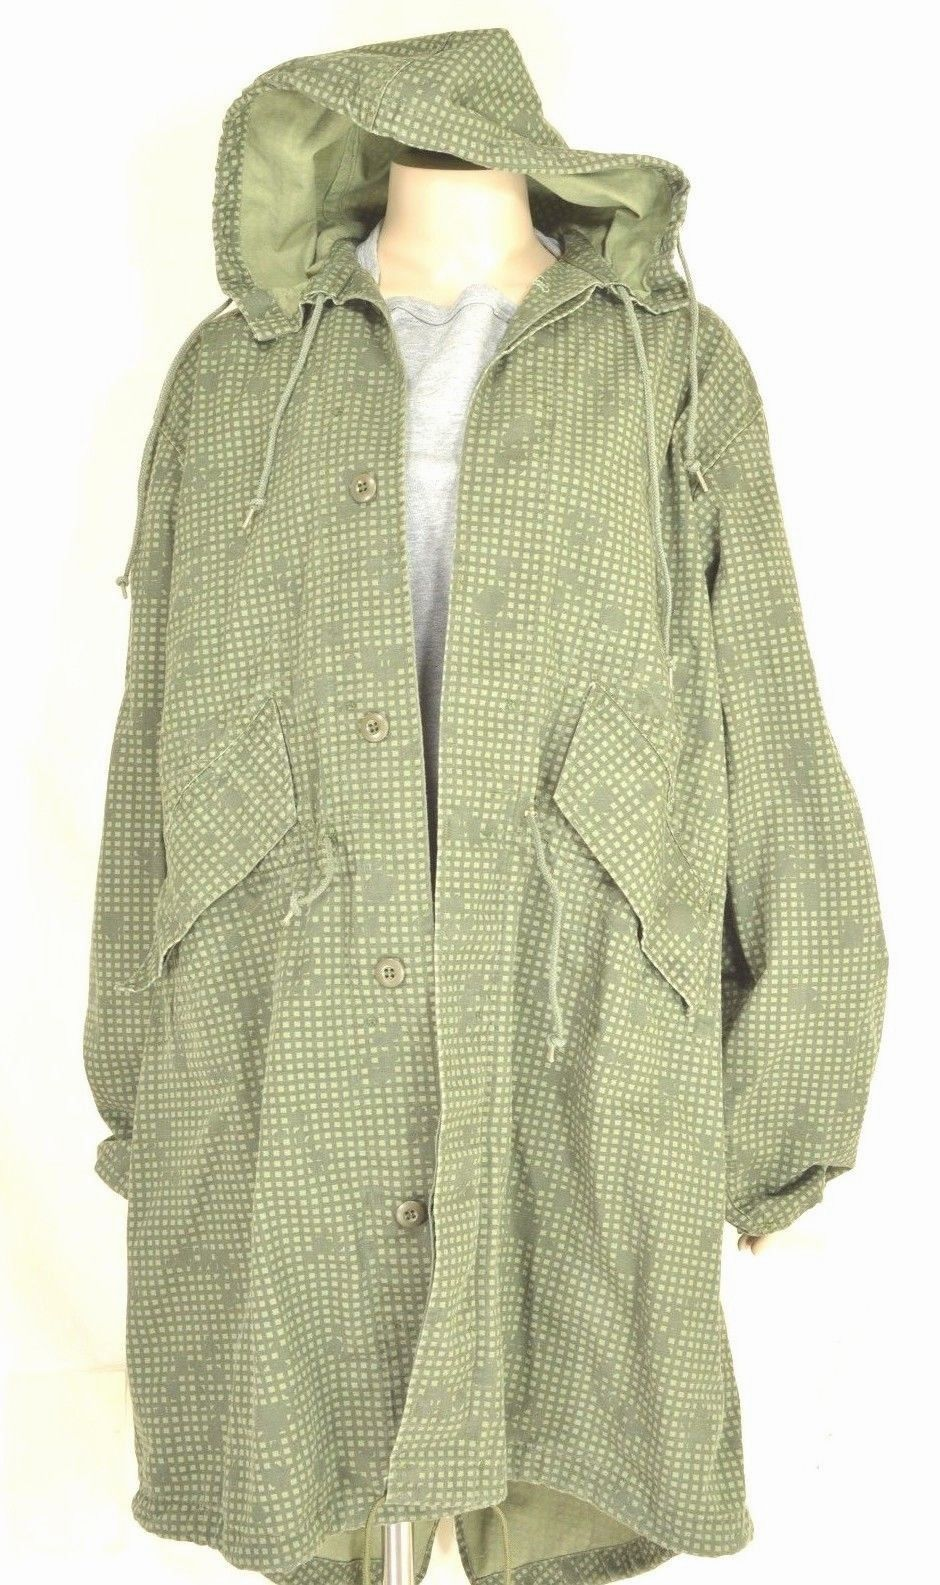 Vtg US Army Fishtail Parka Field Jacket M Desert Night Camo Gulf War Era M51